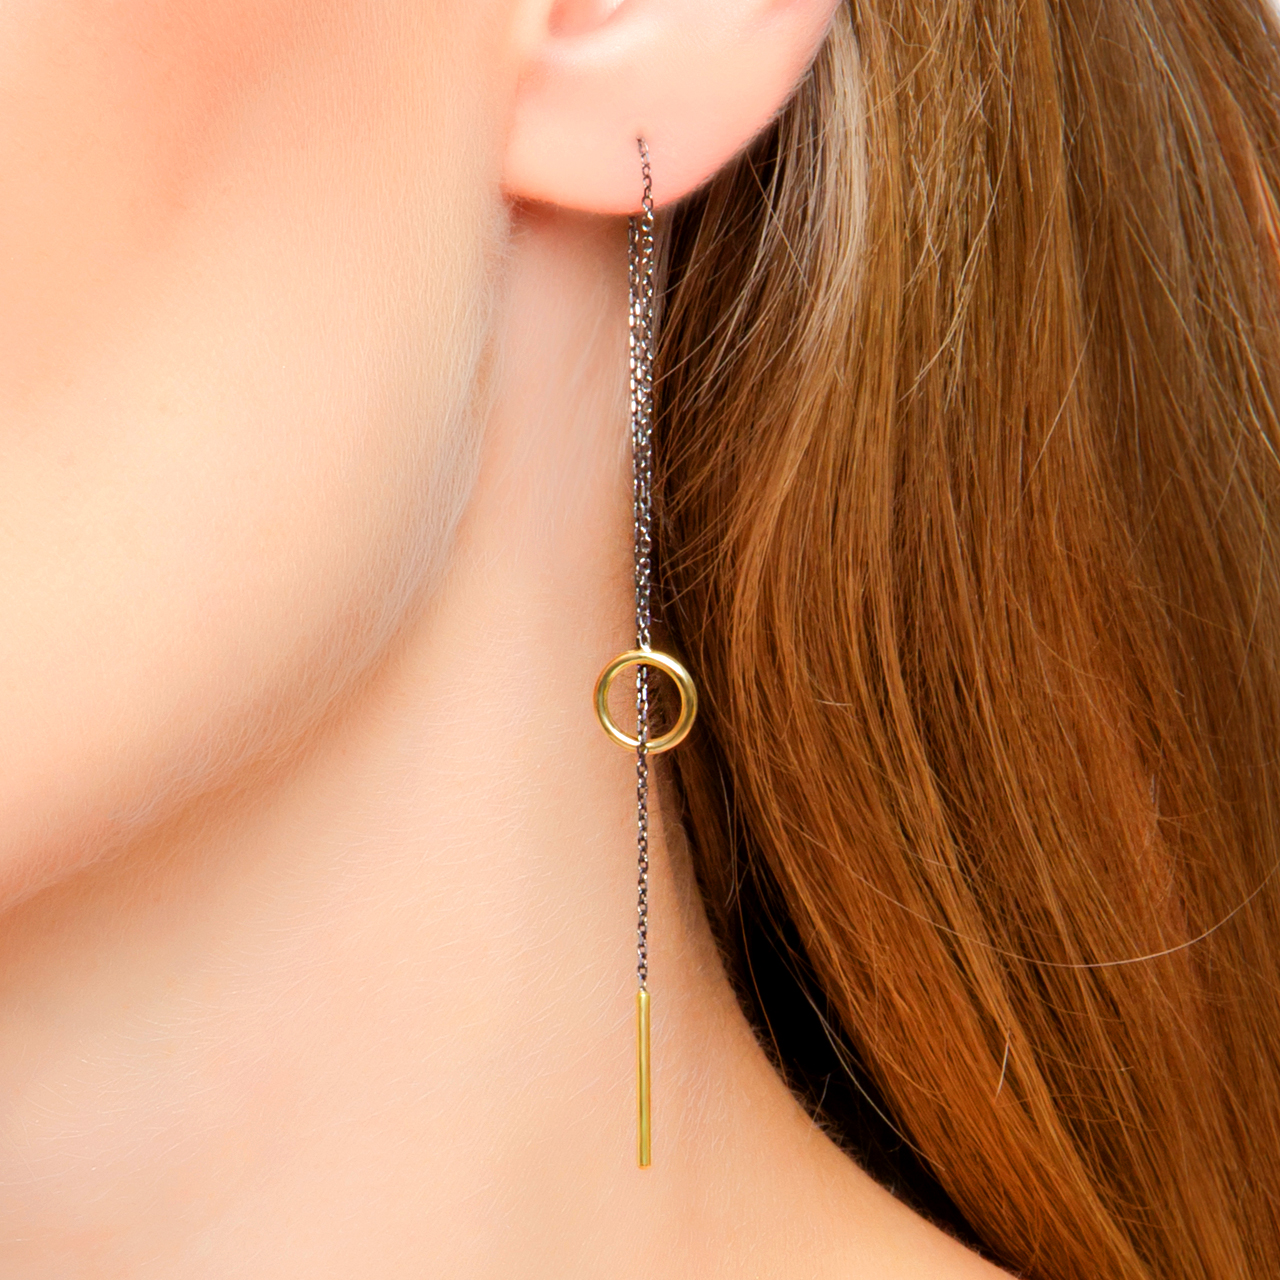 brinco de ródio negro e ouro link minimalista